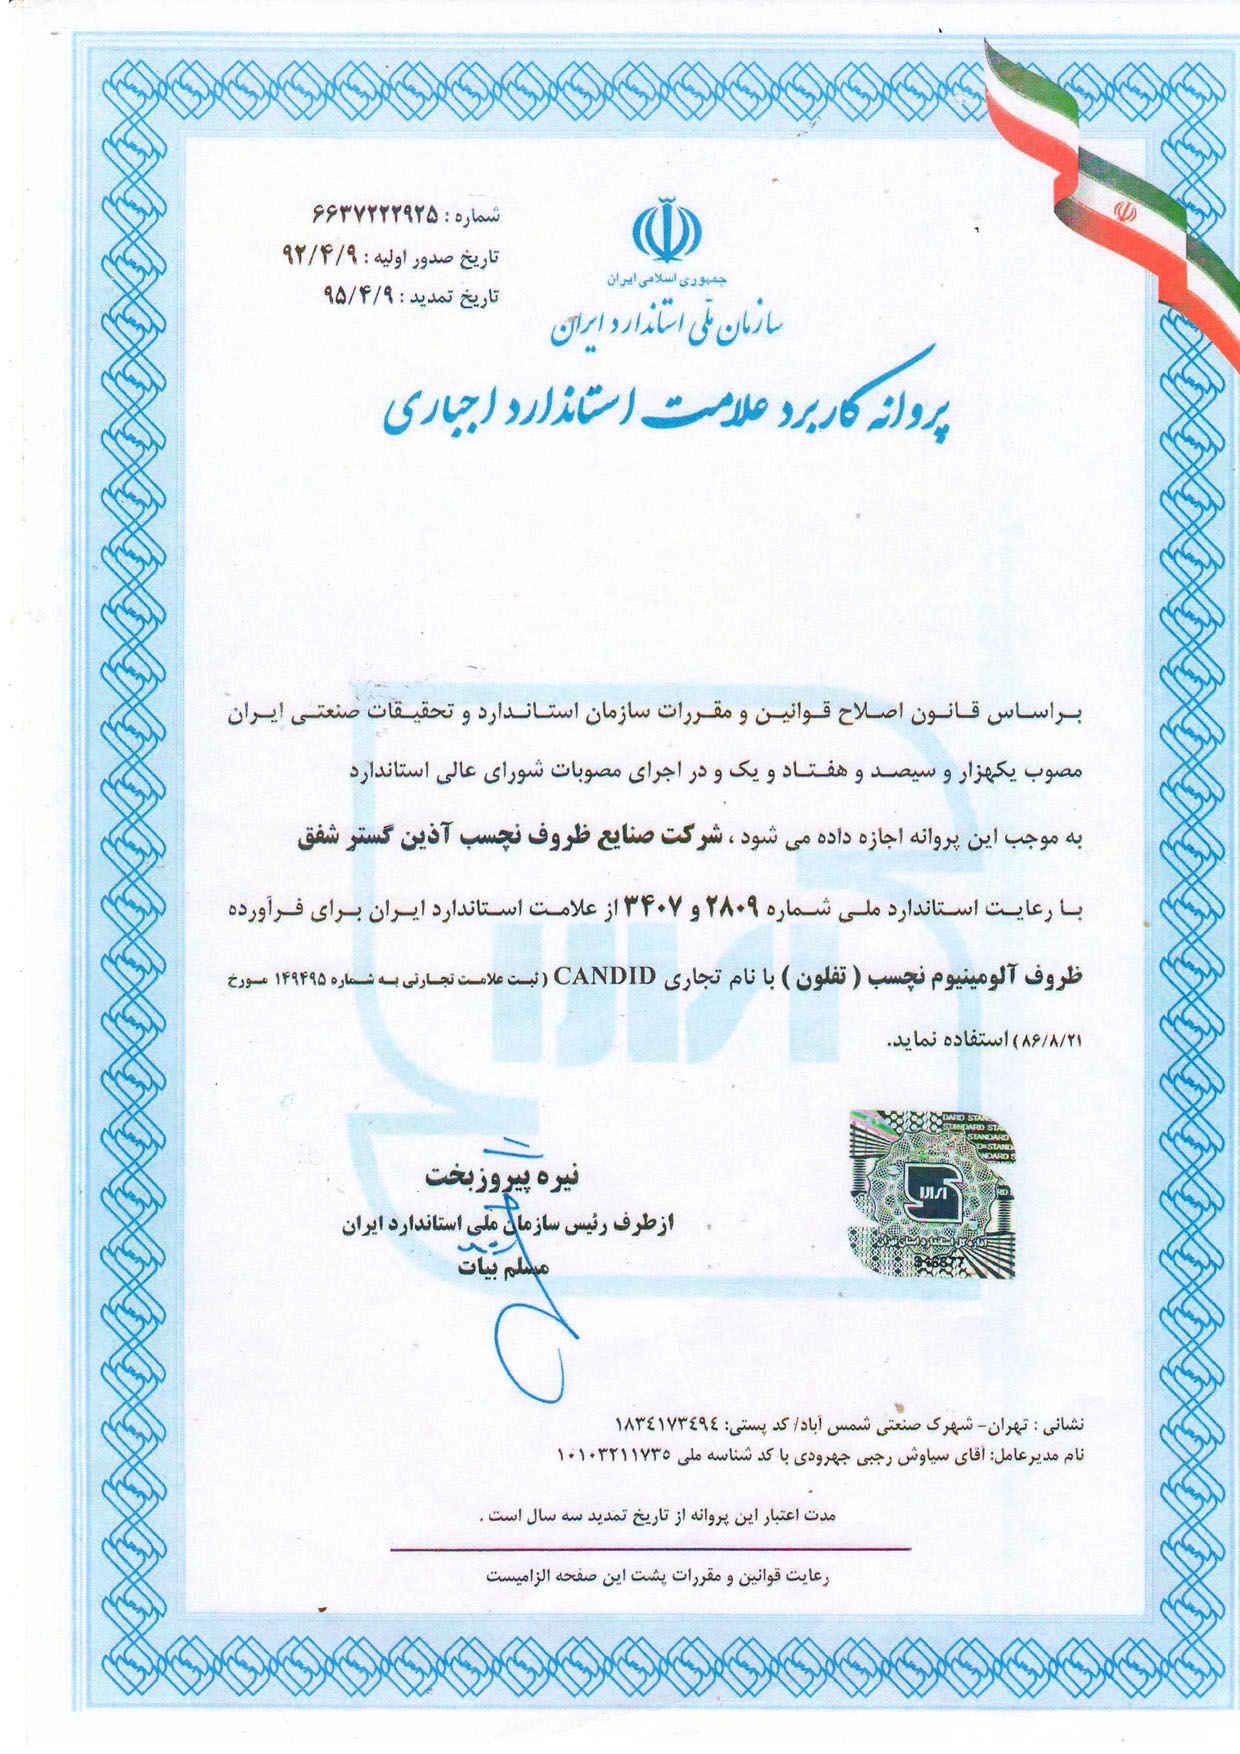 PBA-Pb-Cd FREE certificate